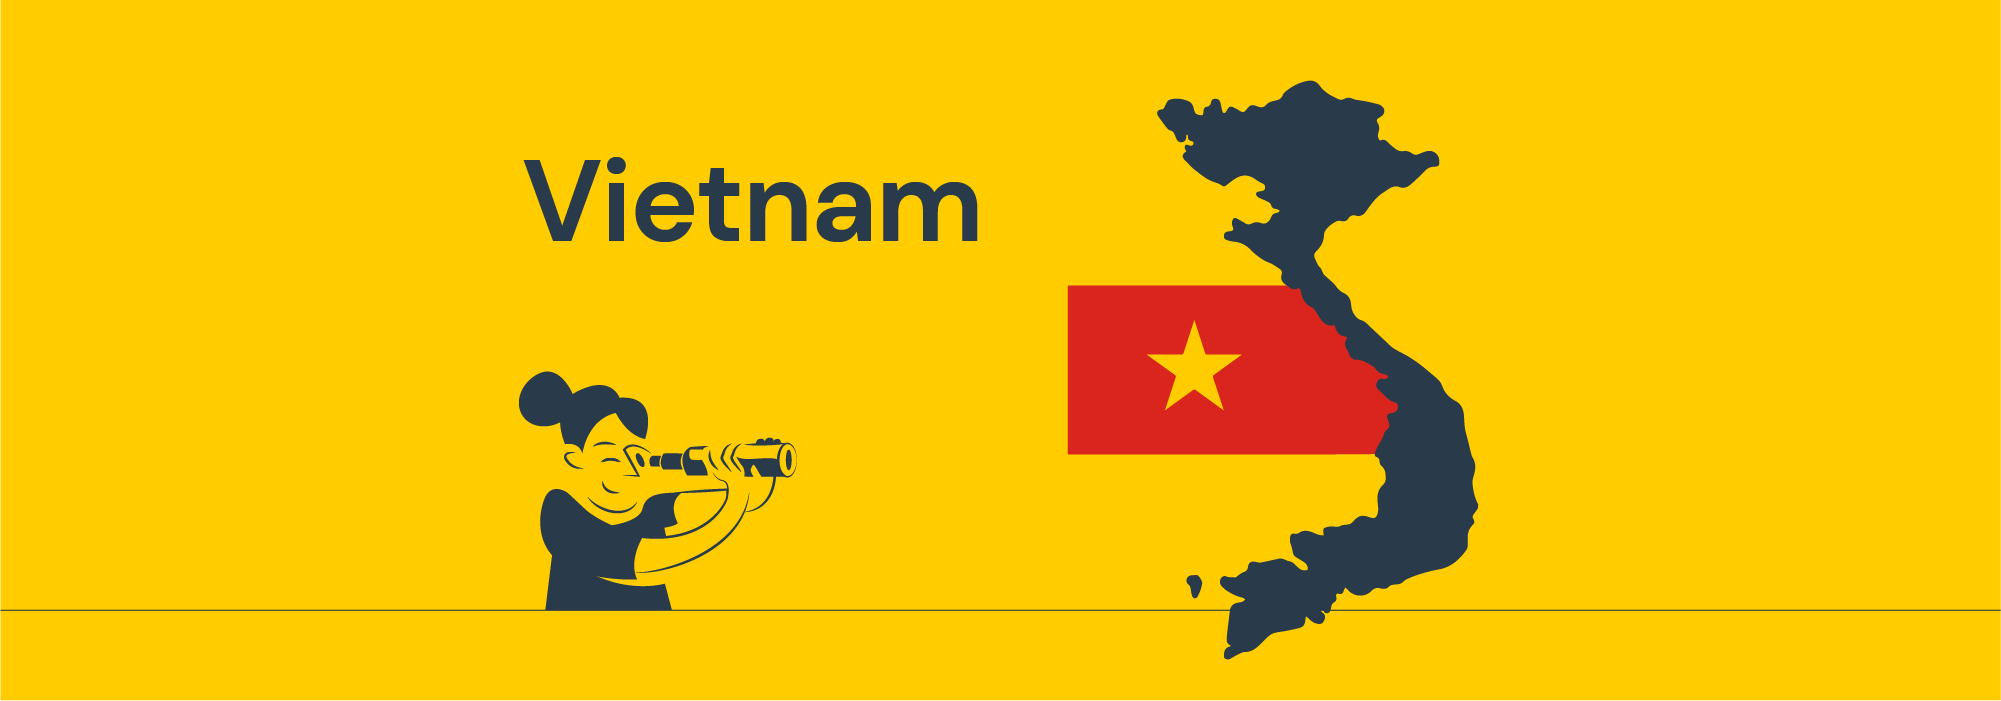 vietnam-international-student-trends-2020